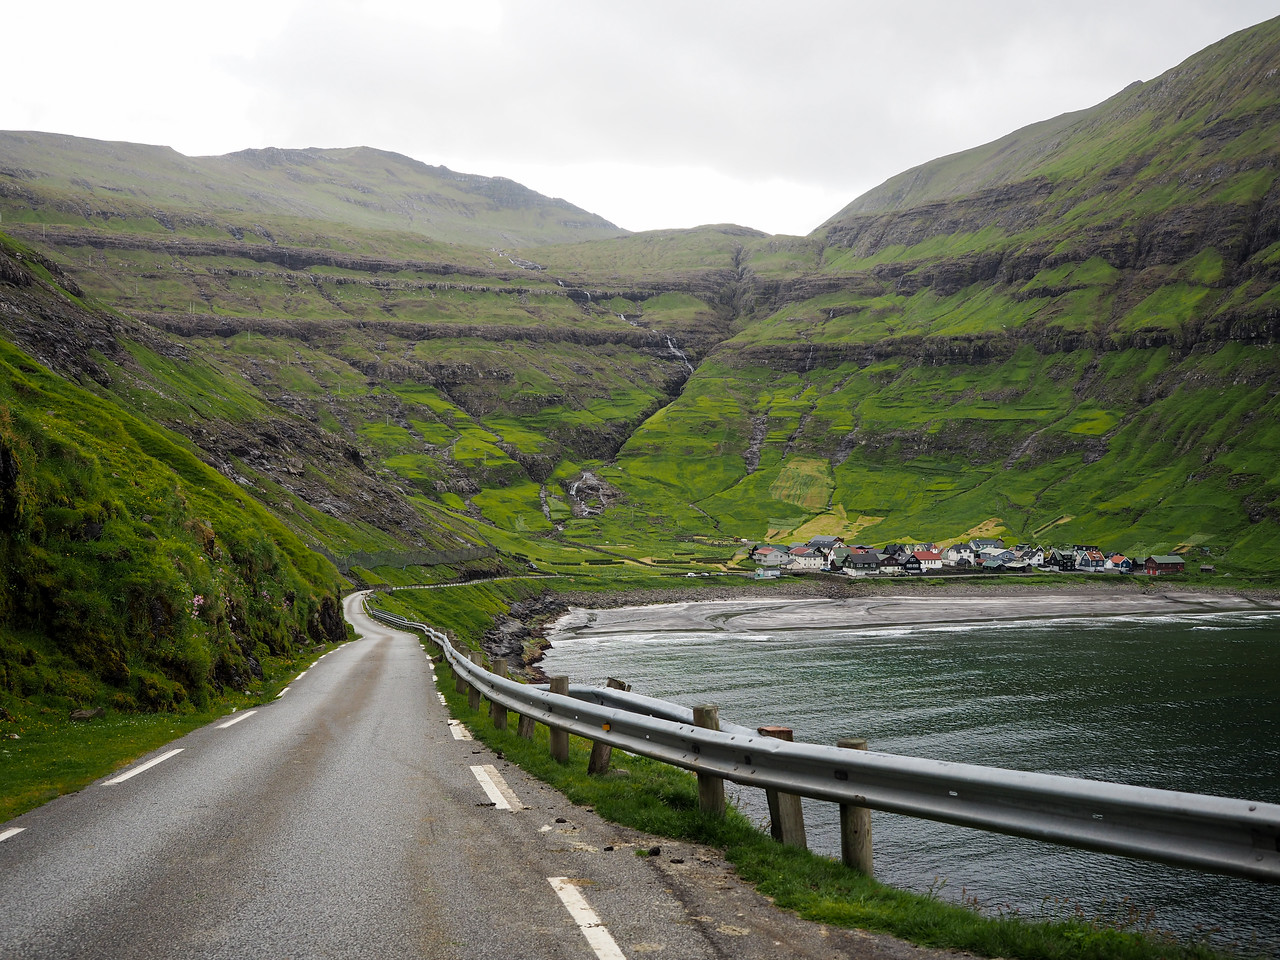 Road tripping to Tjørnuvík in the Faroe Islands